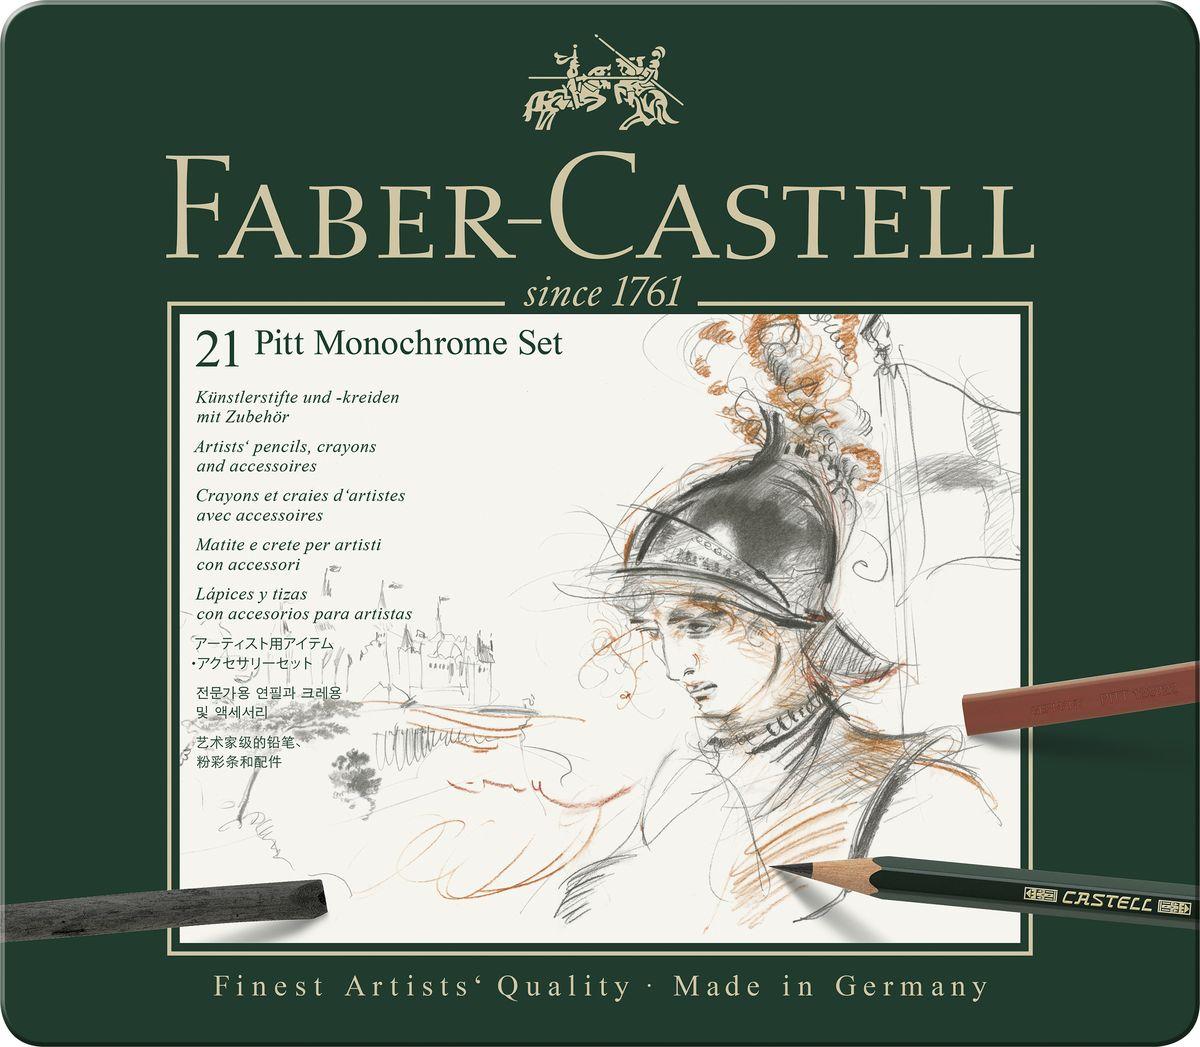 Faber-Castell Художественный набор Pitt Monochrome 21 предмет kinfire e27 3w 230lm 3500k 6 smd 5730 led warm white light lamp bulb ac 85 265v